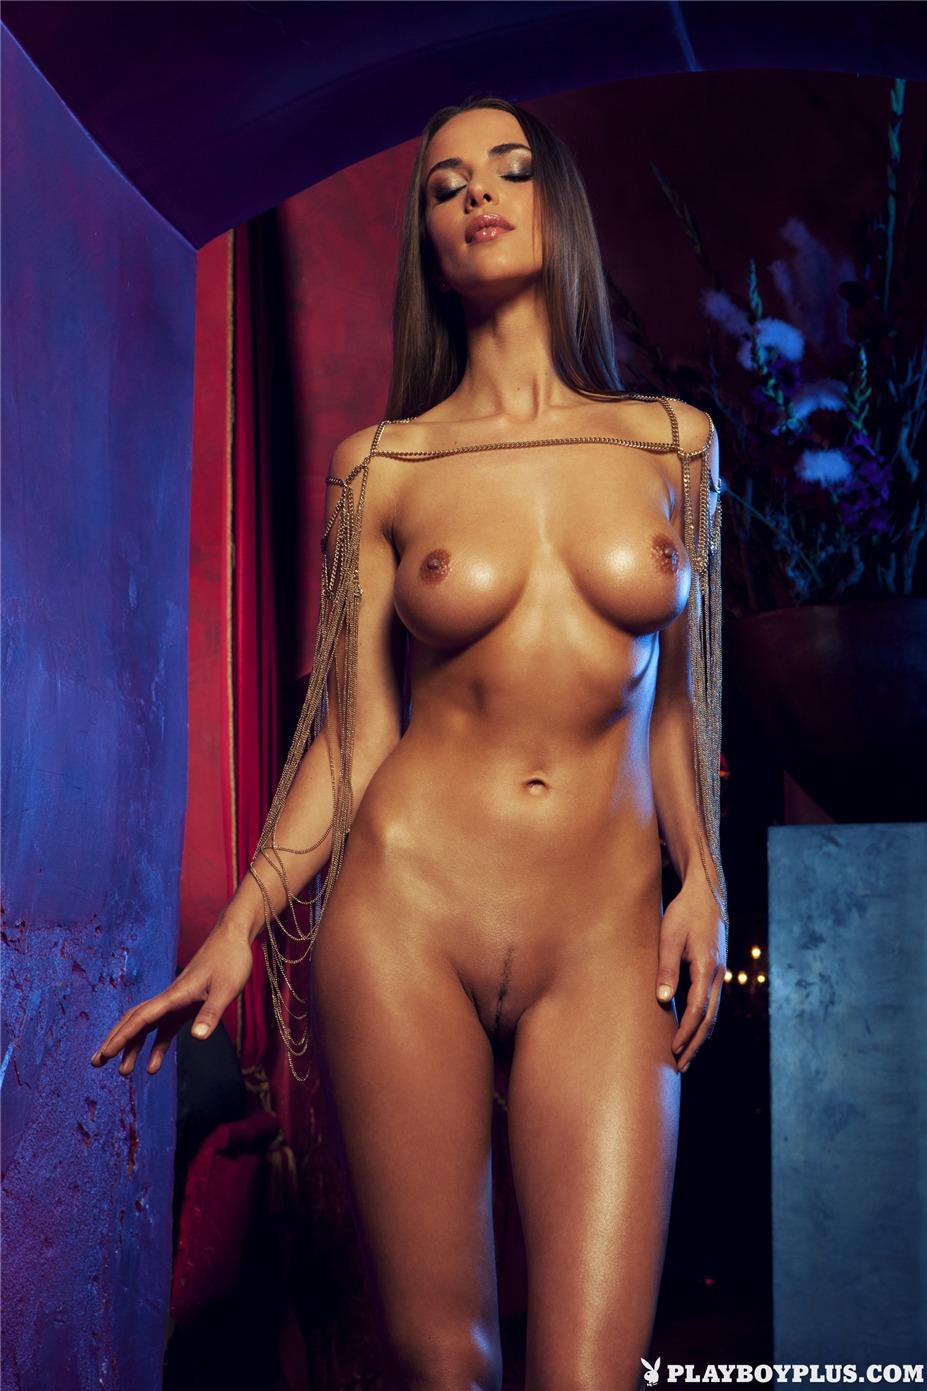 Девушка месяца Линь Бишевол / Lien Biesheuvel - Playboy Netherlands april 2013 playmate